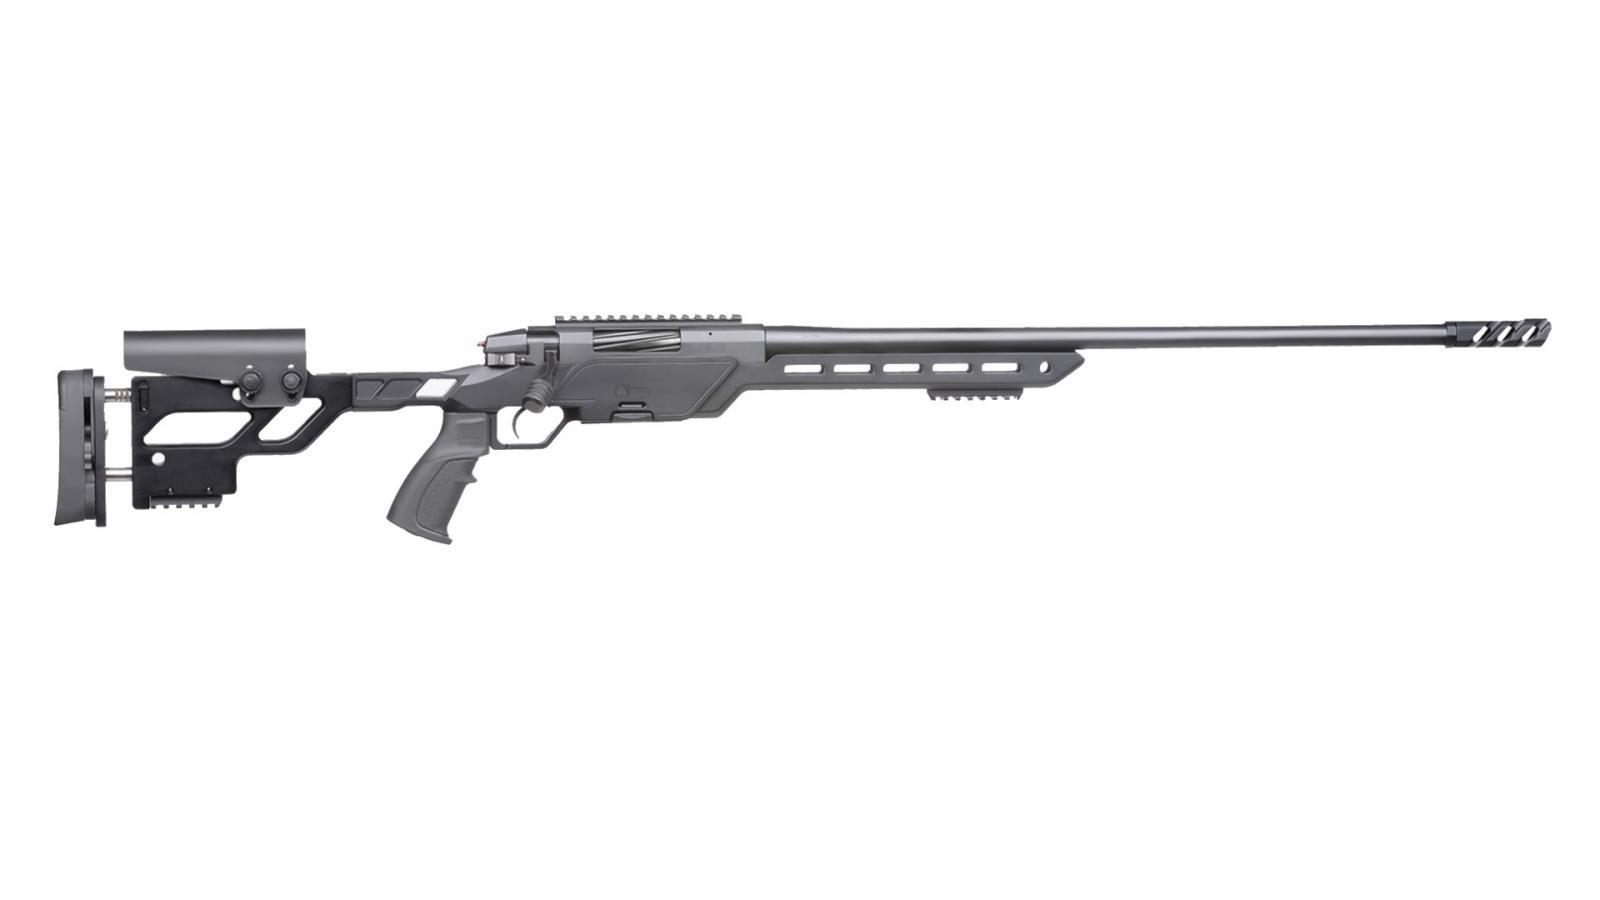 Carabine à répétition ATA Turqua ALR Cal. 6.5 Creedmoor